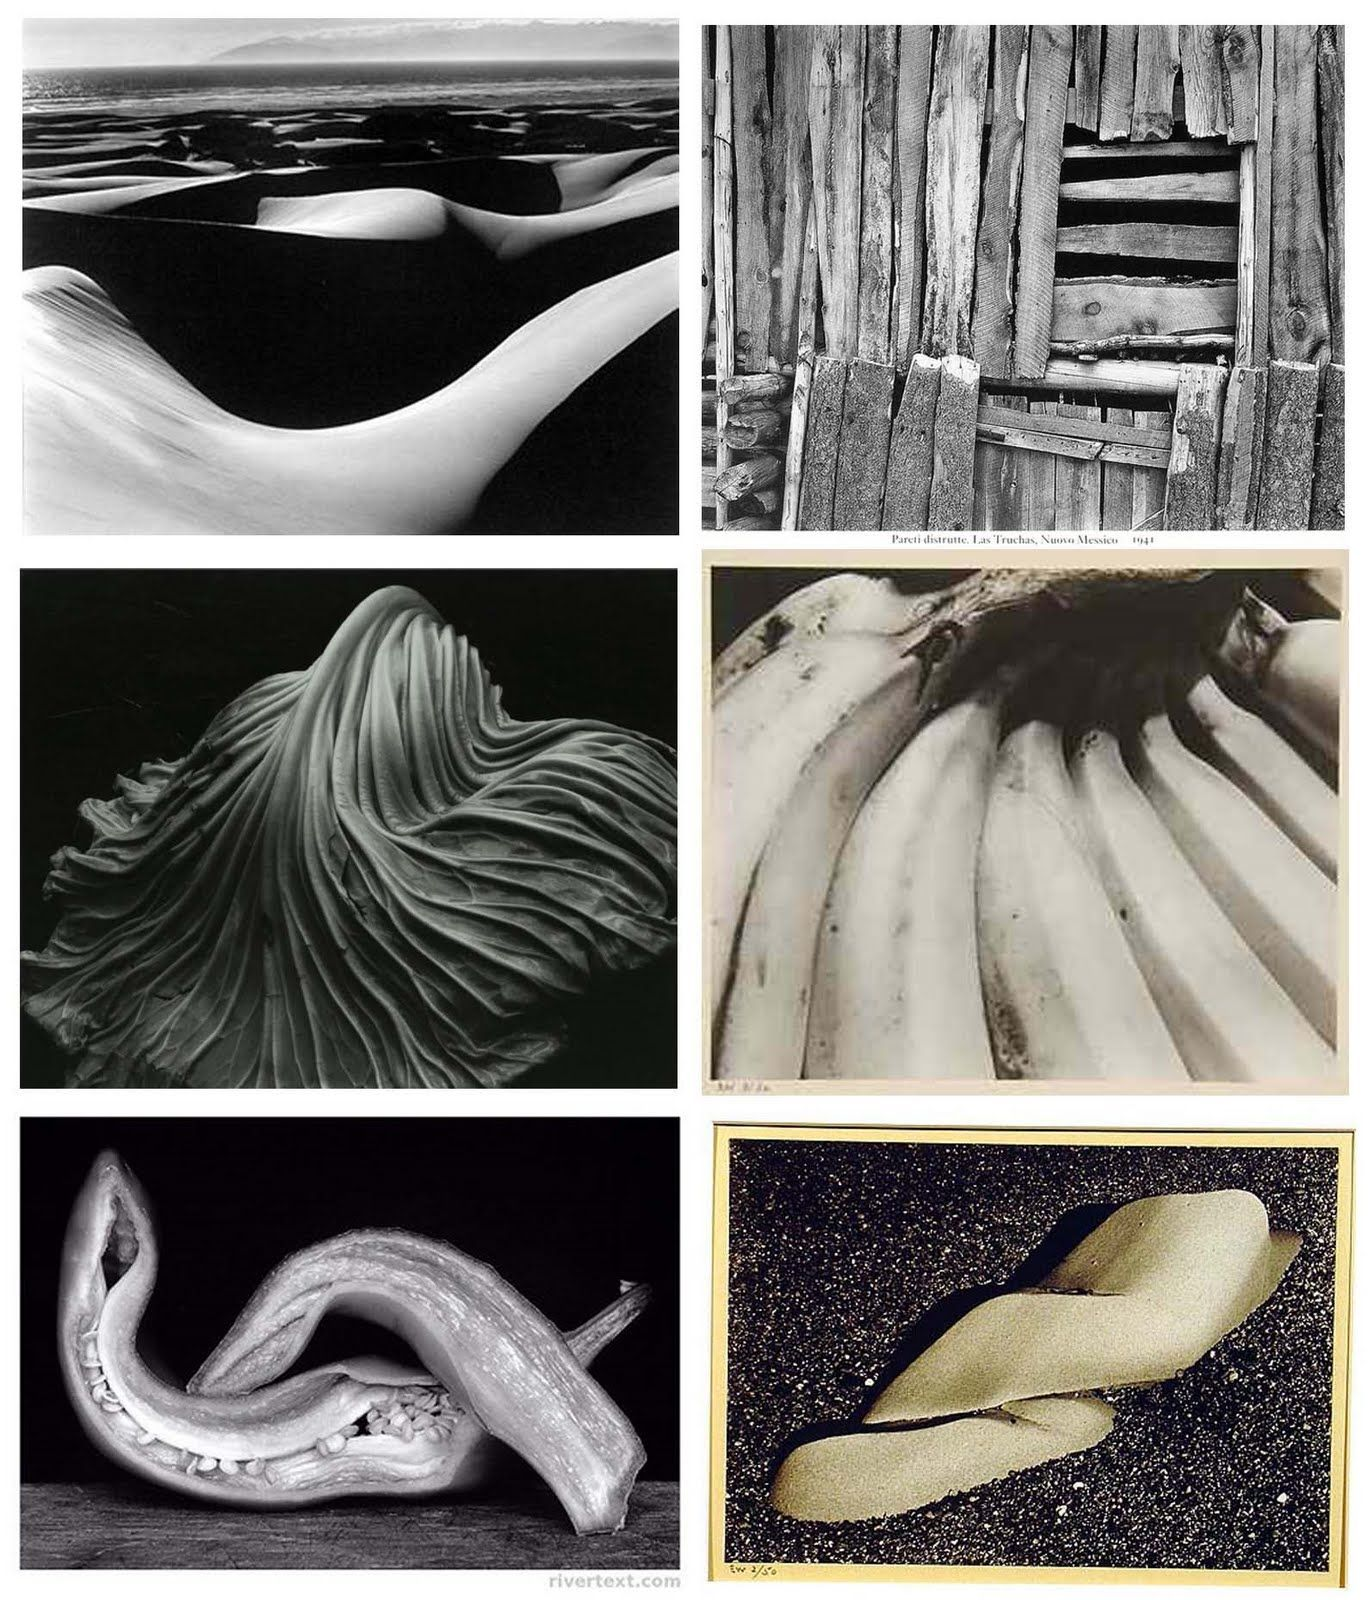 Edward Weston, Still Life, American Photographer 1886-1958